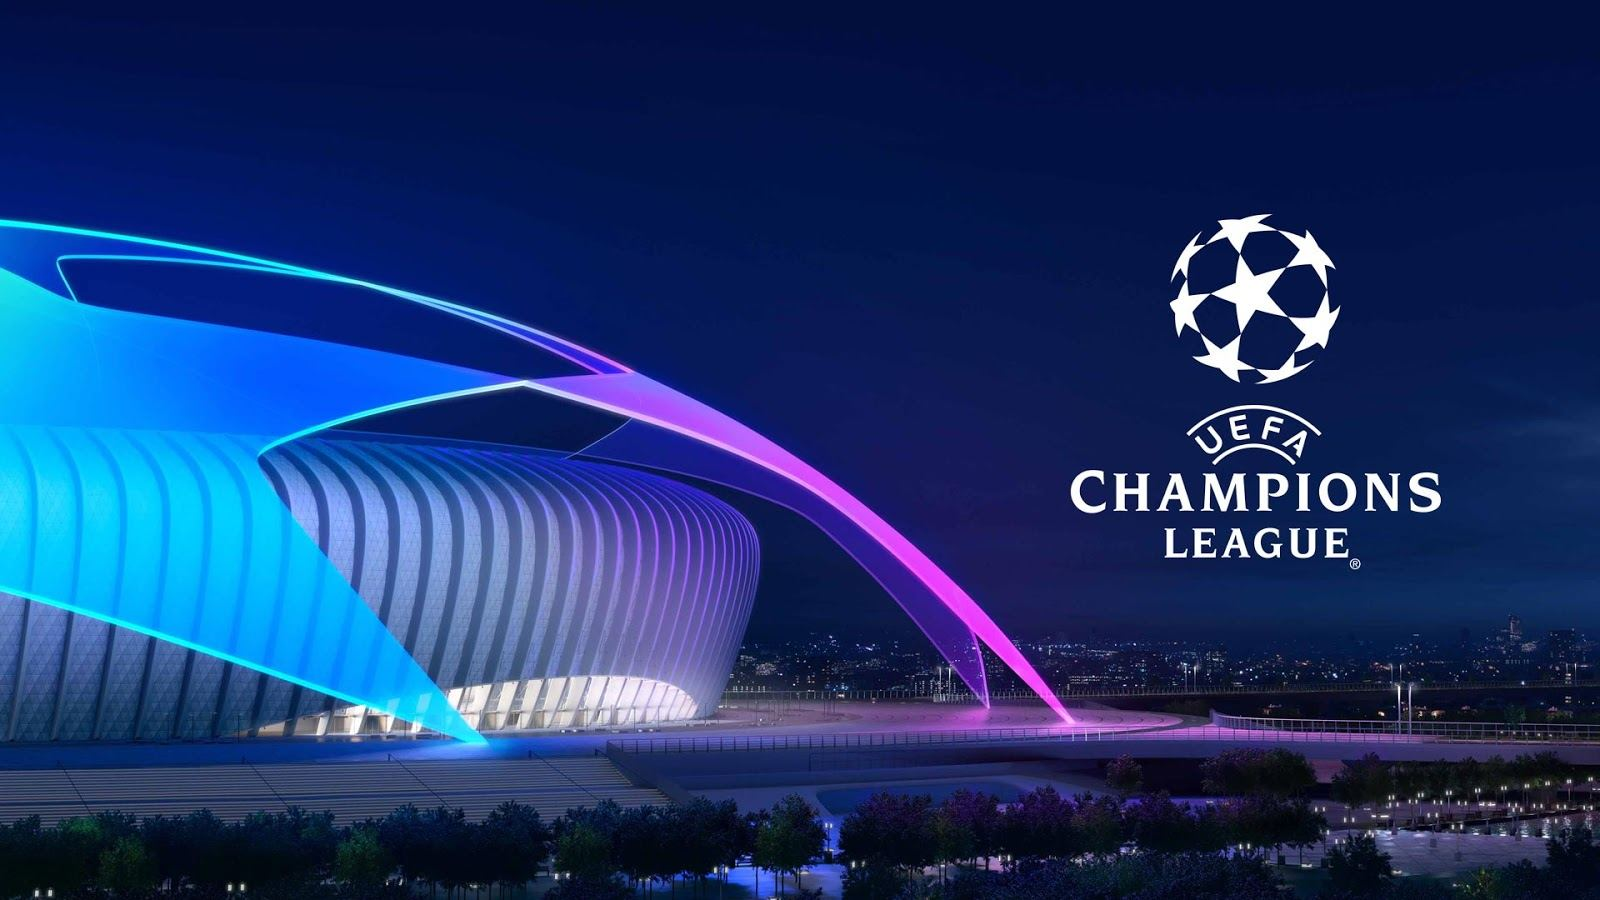 Champions League 2018 19 Pinterest: Những Thay đổi Về Champions League 2018-19